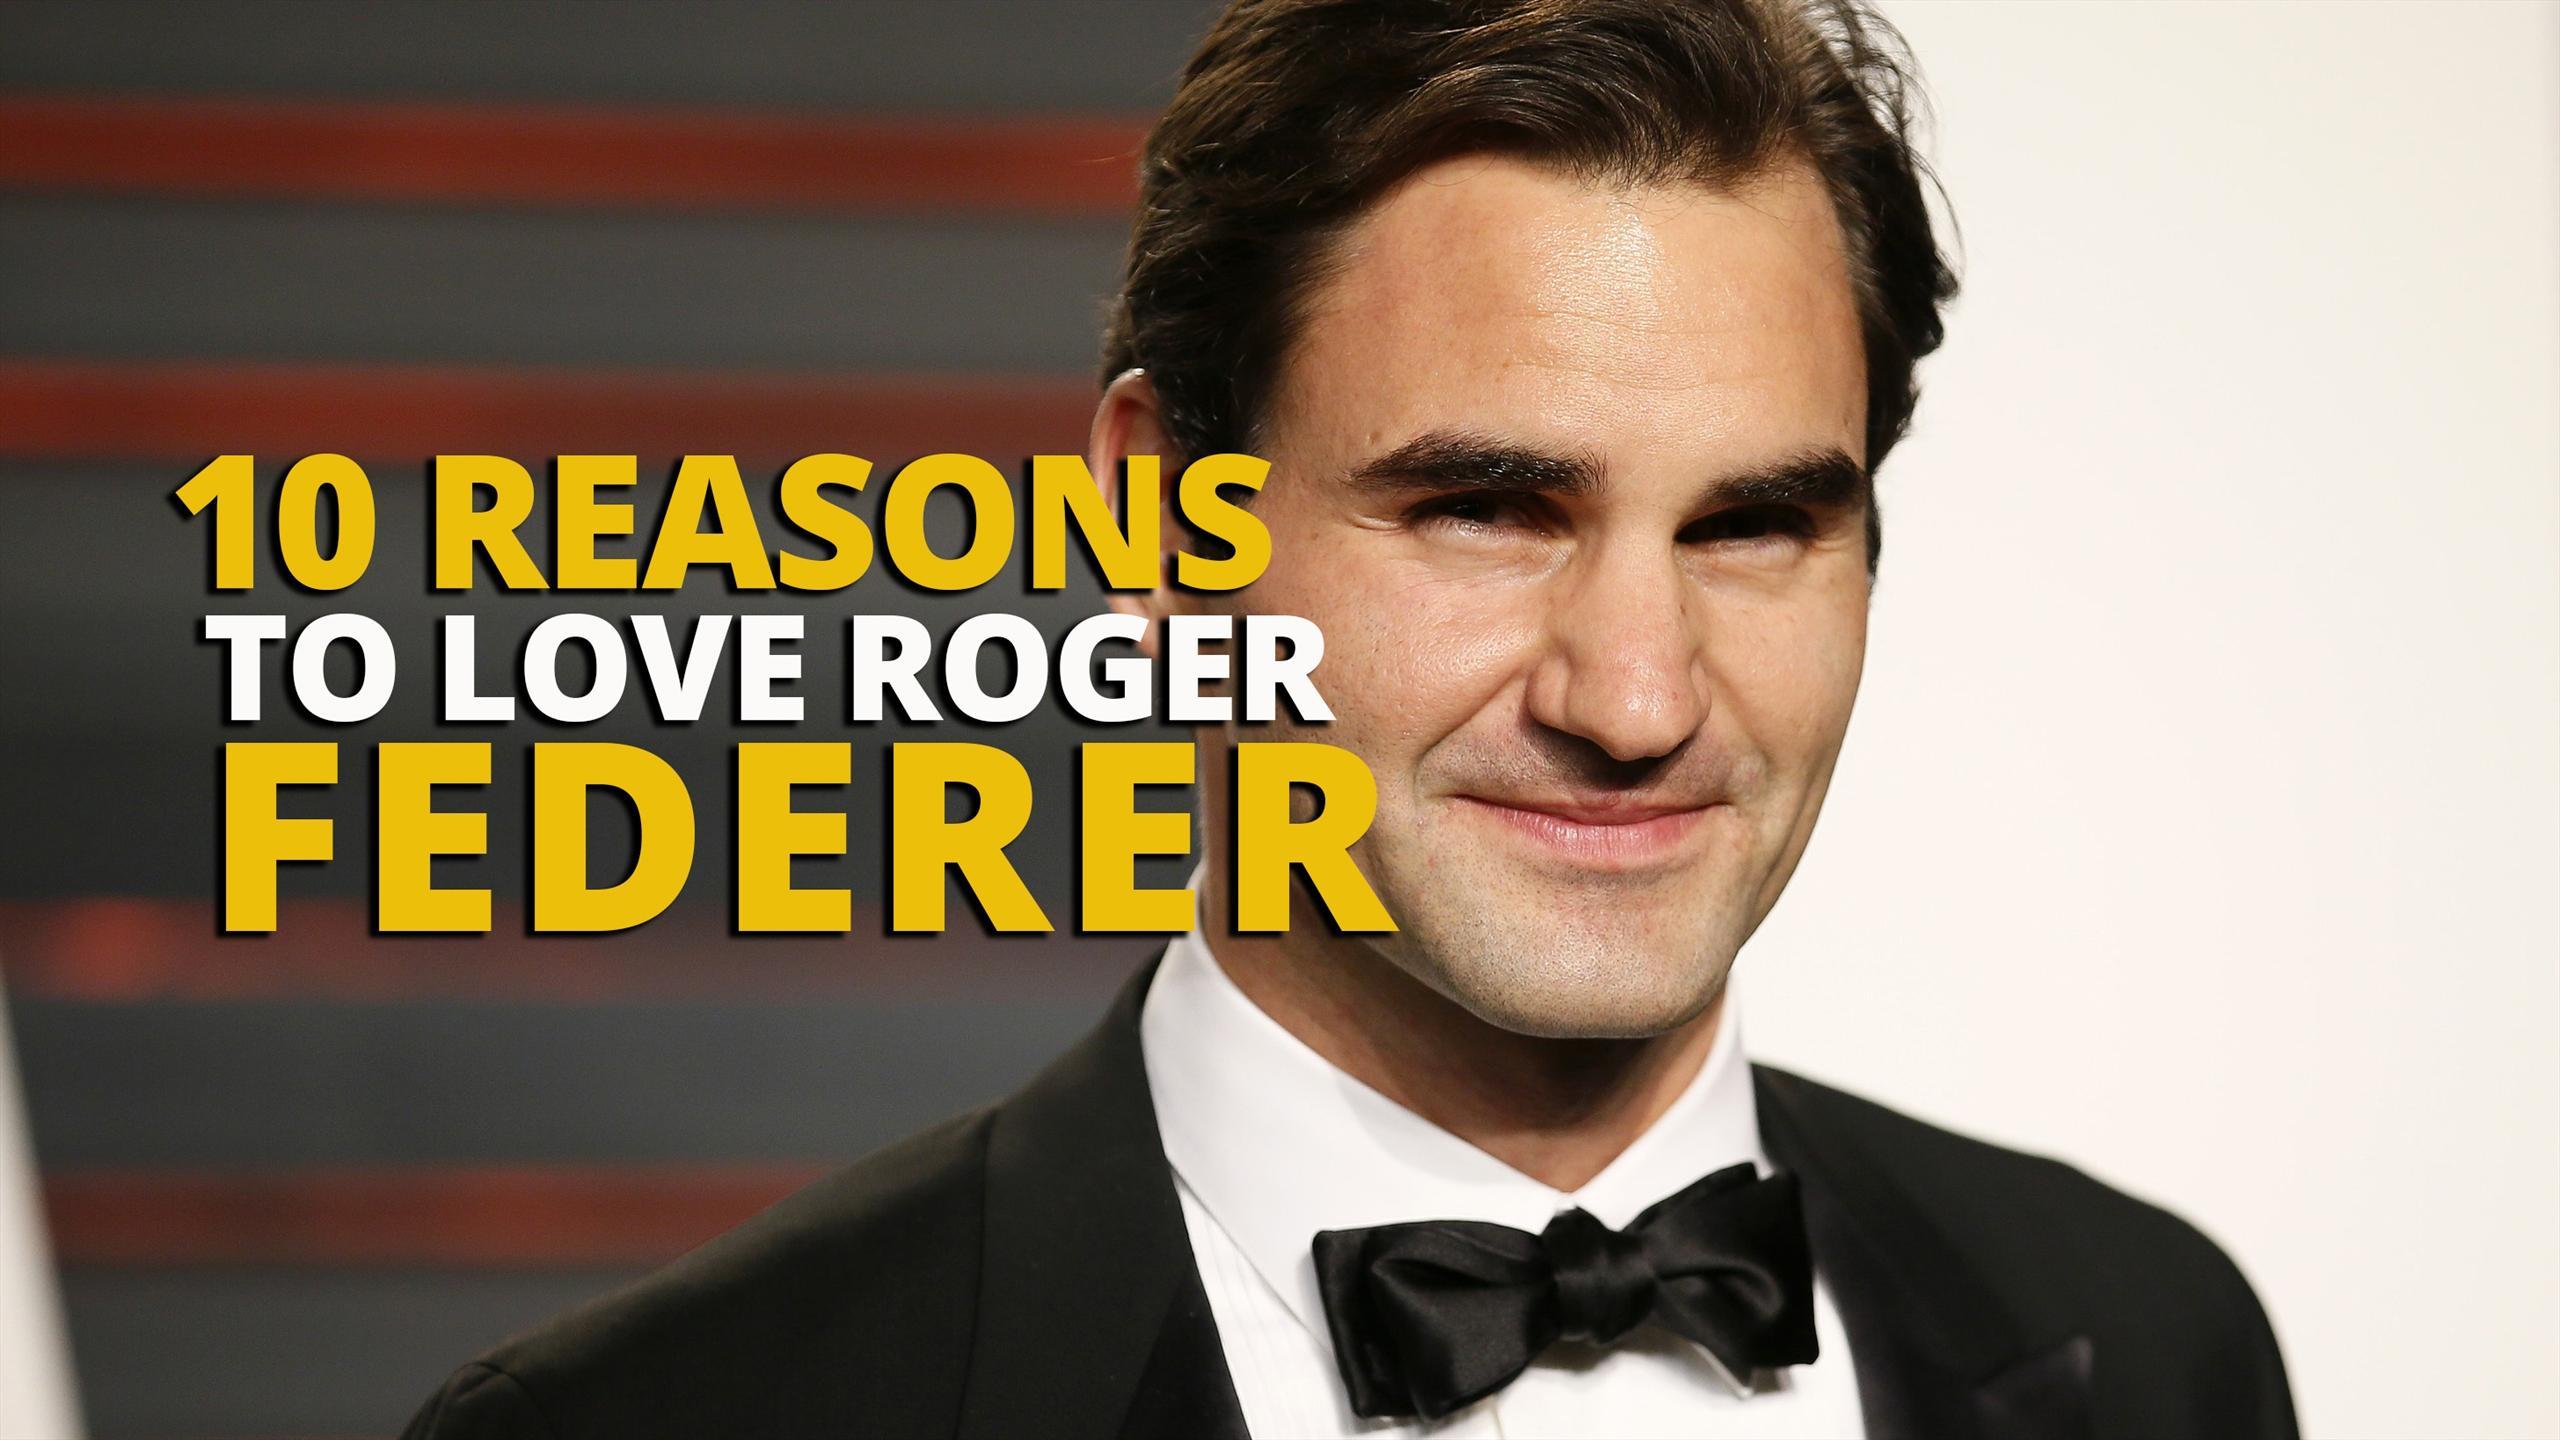 Why everybody loves Roger Federer - 10 reasons